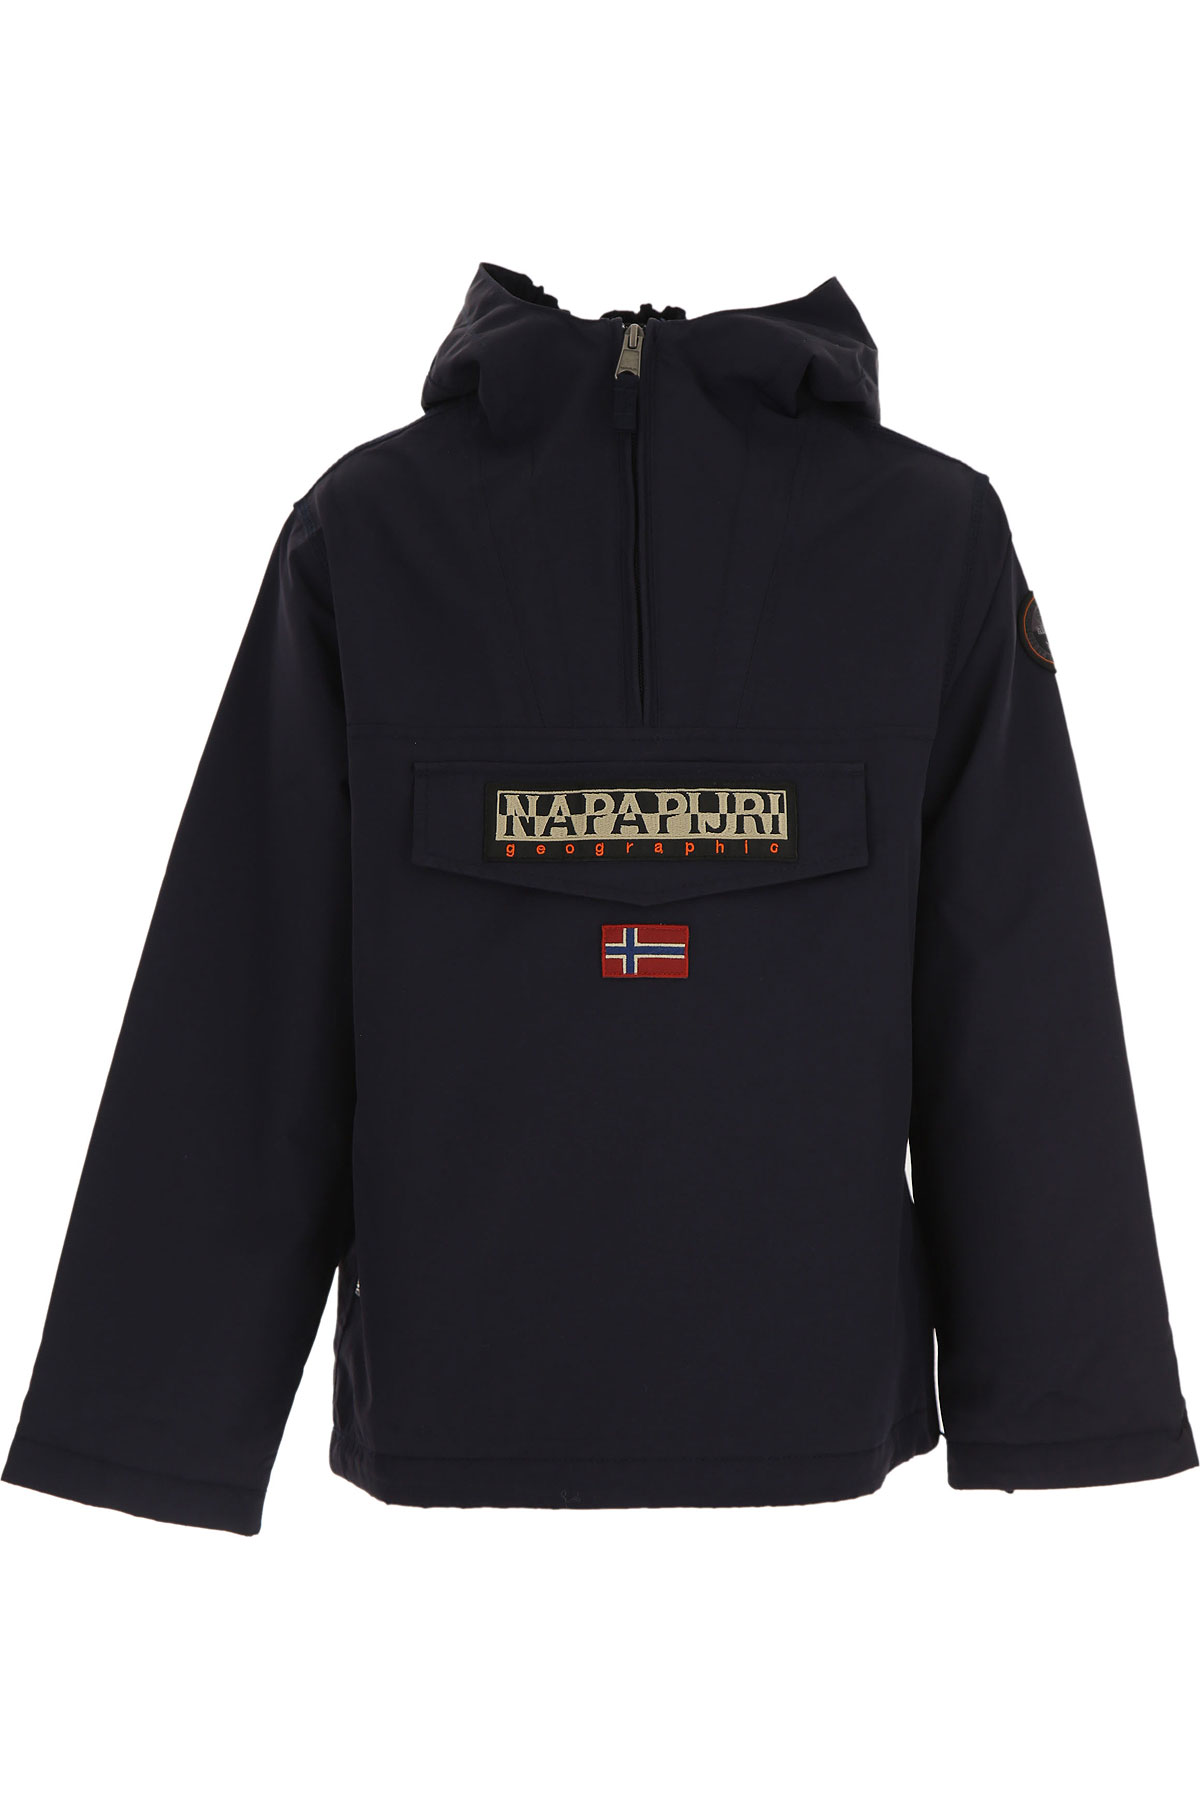 Napapijri Boys Down Jacket for Kids, Puffer Ski Jacket On Sale, Blue, polyester, 2019, 10Y 16Y 6Y 8Y